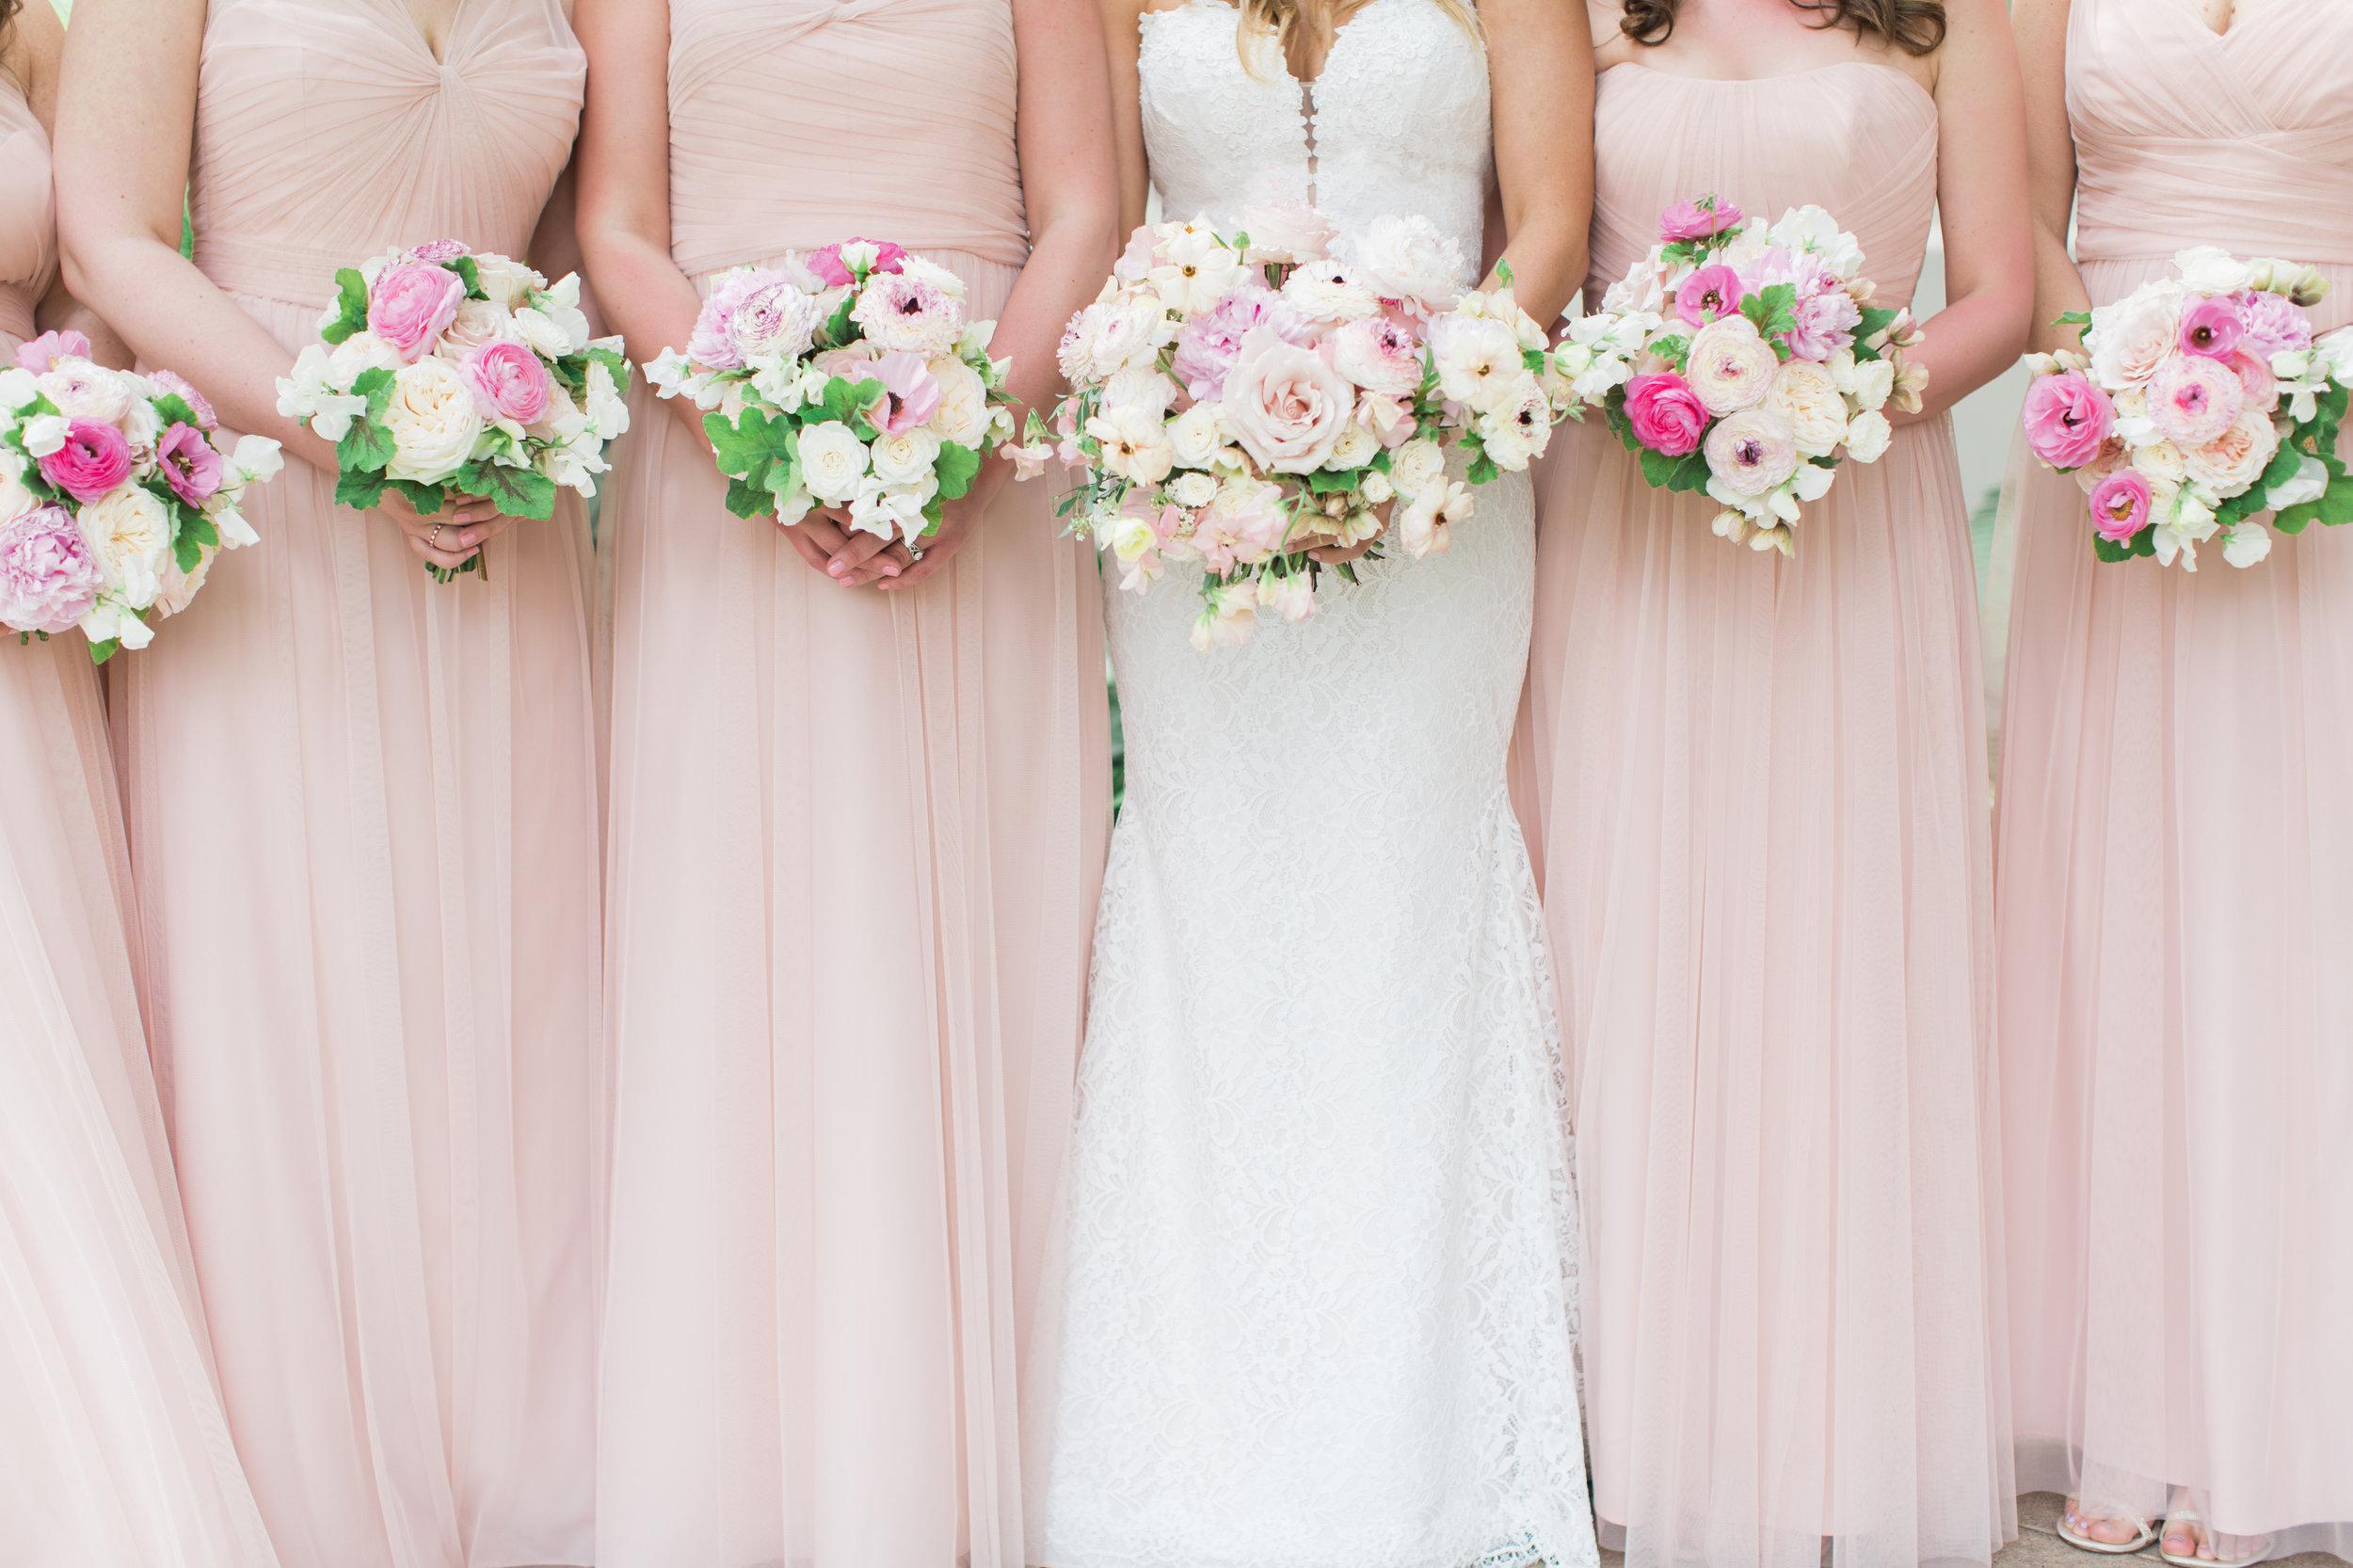 Park Hyatt Wedding Photographer Leah Vis  (3).jpg